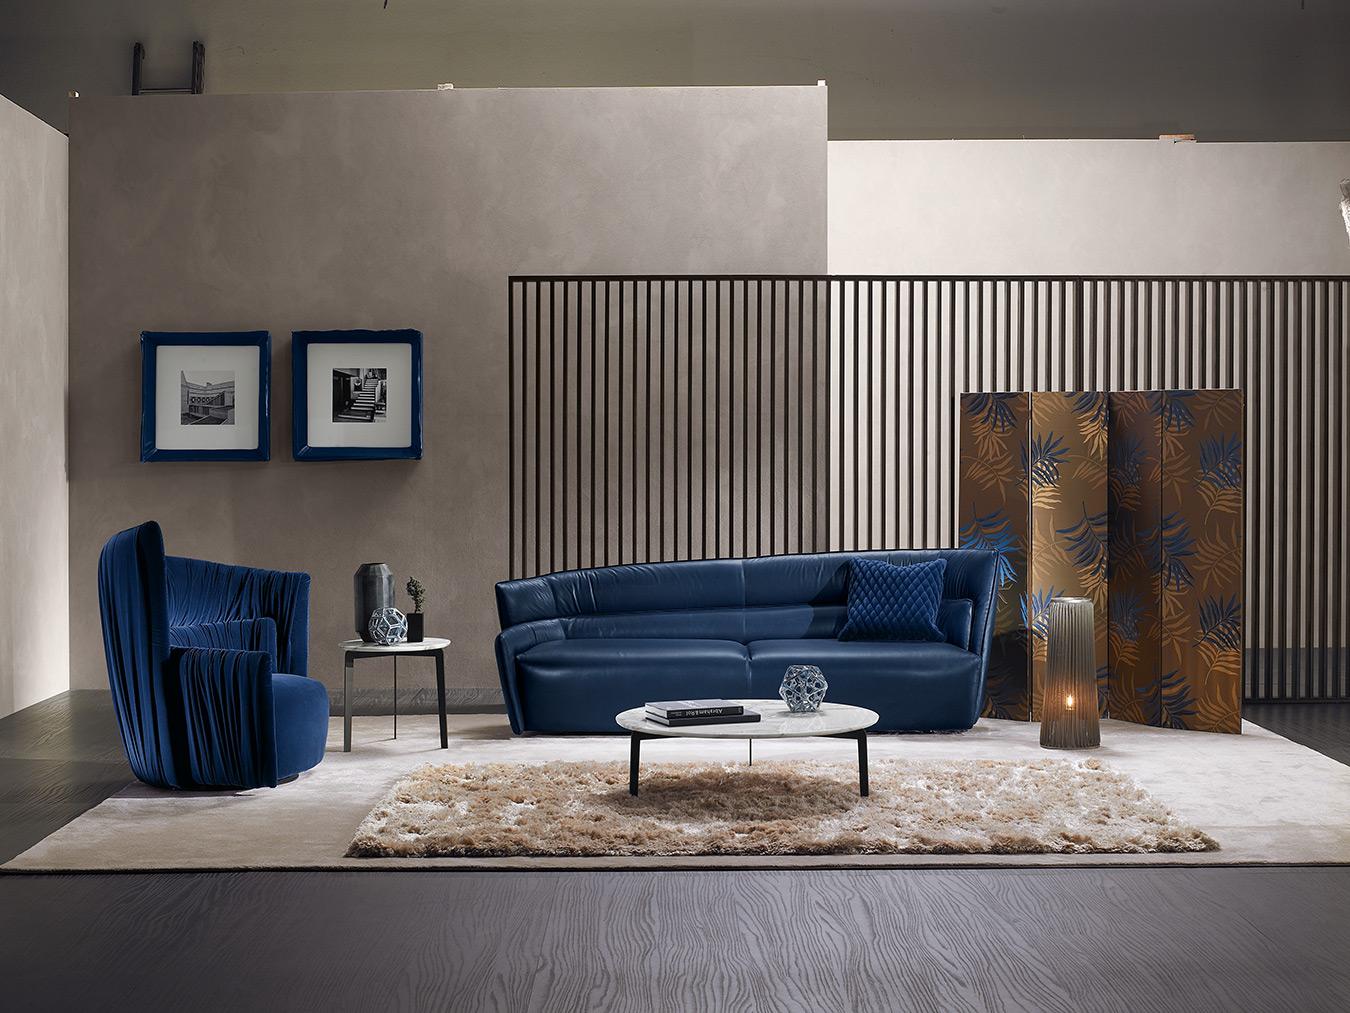 blue leather sofa with extreme design, stylish luxury design 3- seater sofa, tritheseos kanapes mple me tin diki tou mple karekla, blue velvet armchair with blue sofa,